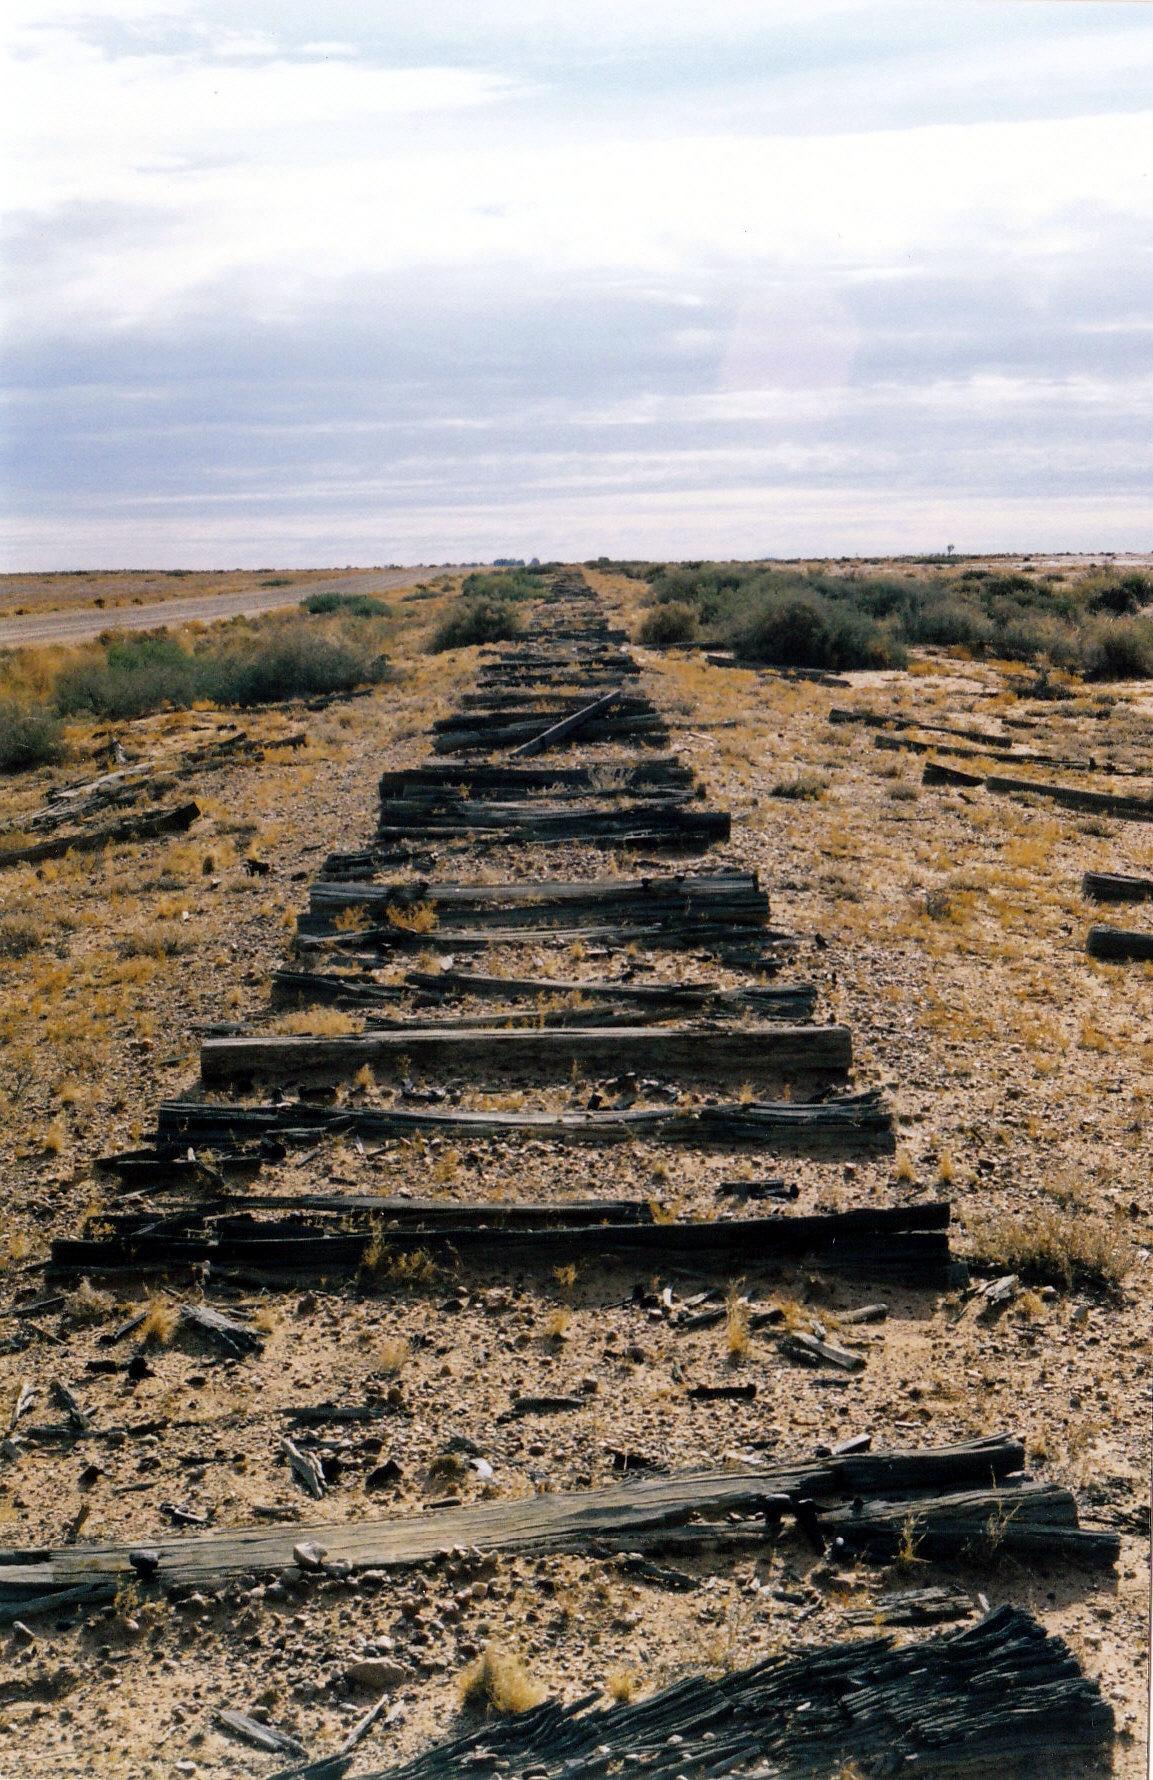 05-27-1999 04 old ghan rail remains.jpg